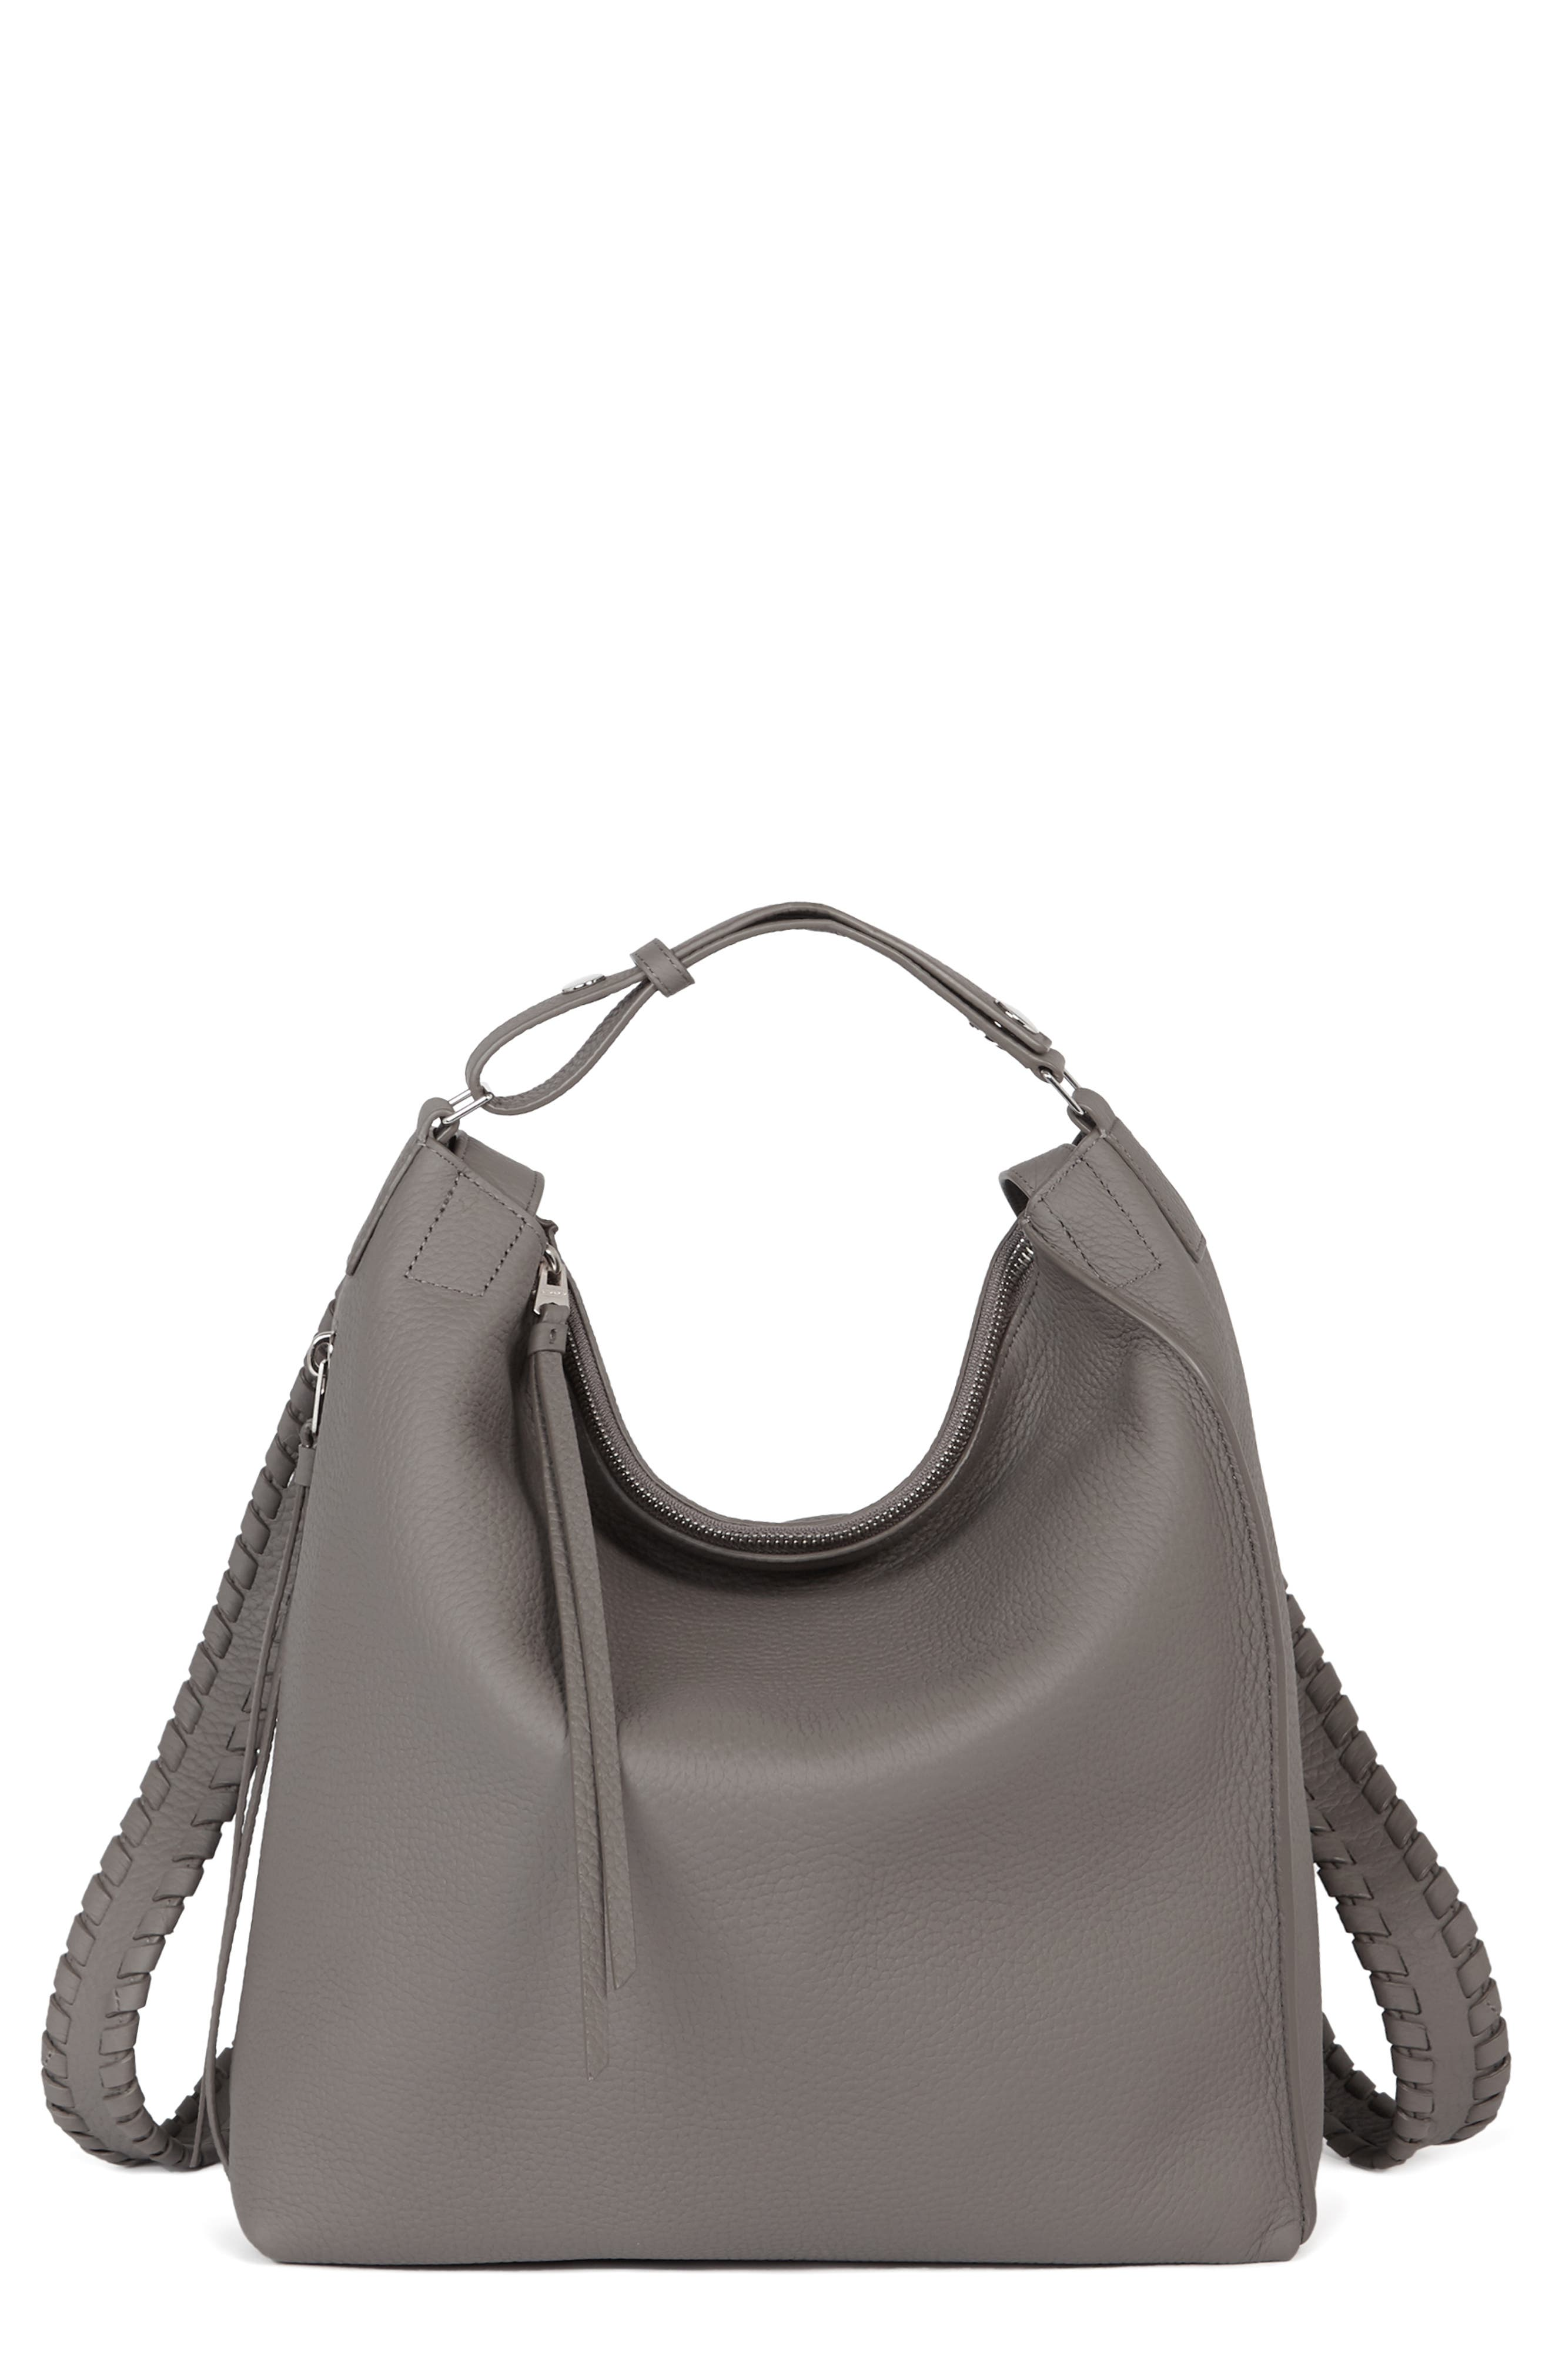 ALLSAINTS, Small Kita Convertible Leather Backpack, Main thumbnail 1, color, STORM GREY